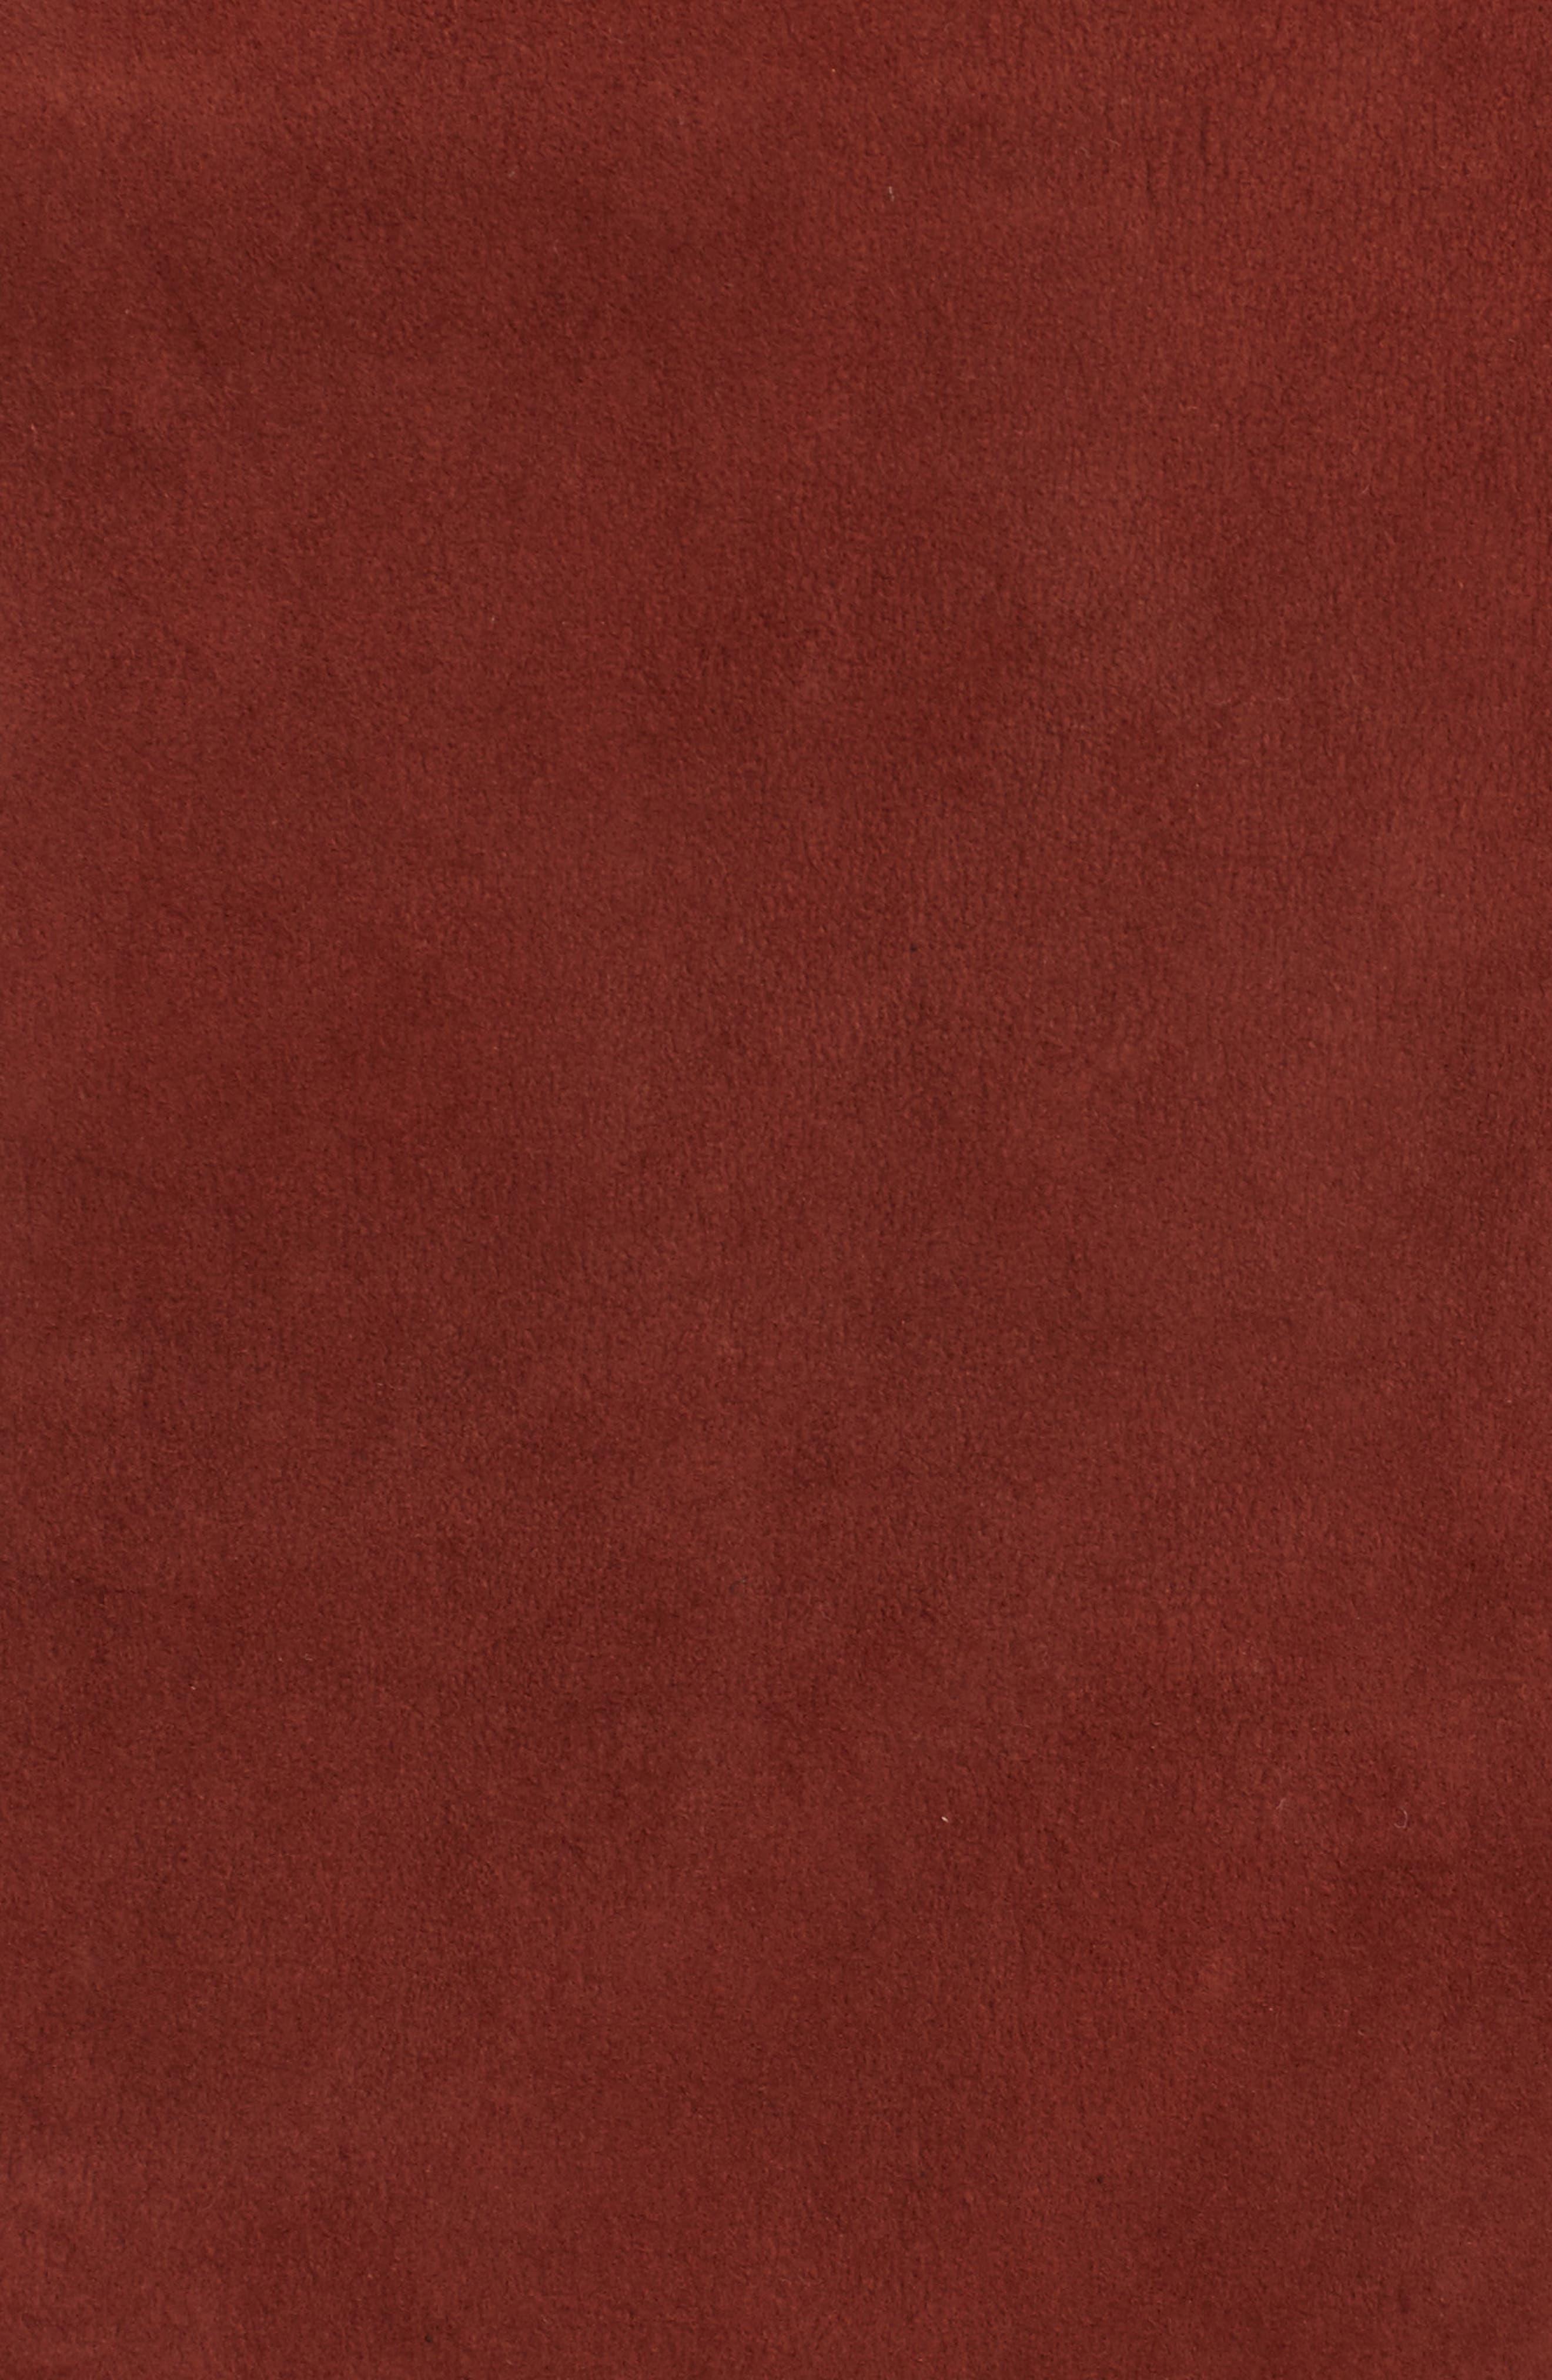 Morene Stretch Suede Jacket,                             Alternate thumbnail 5, color,                             Brown Russet